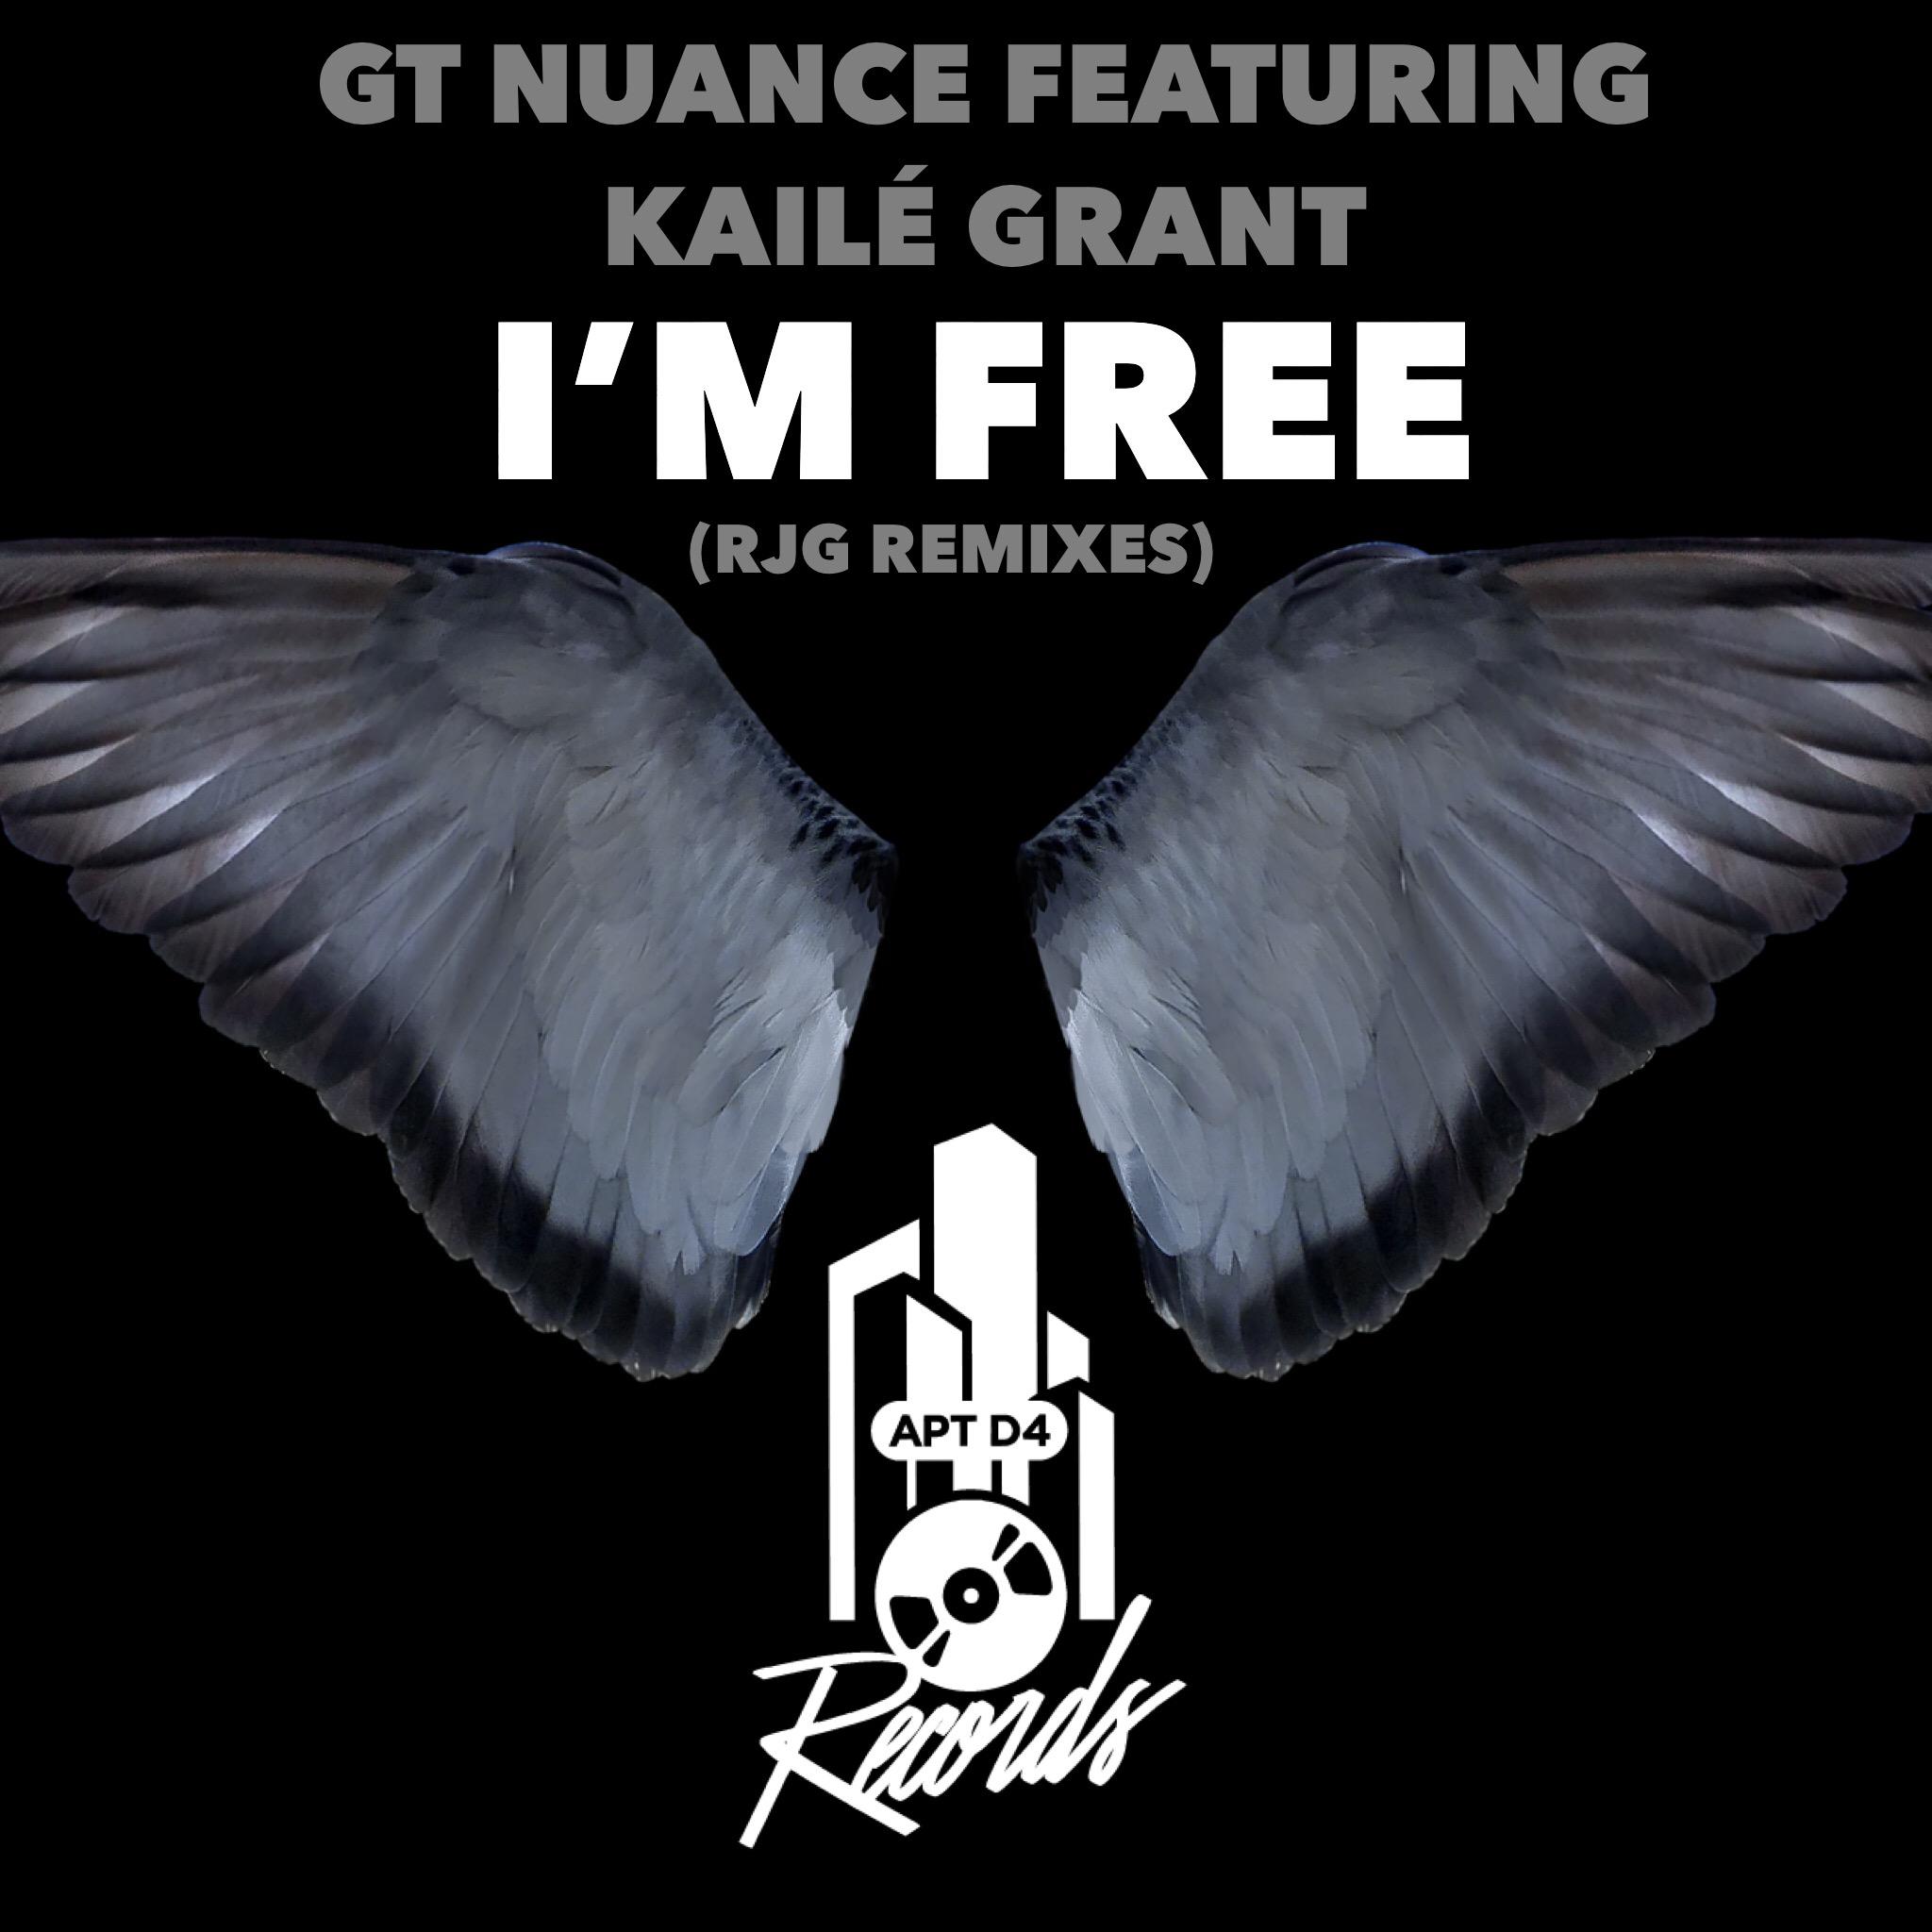 APT006 - I'm Free - Mar 16 2018